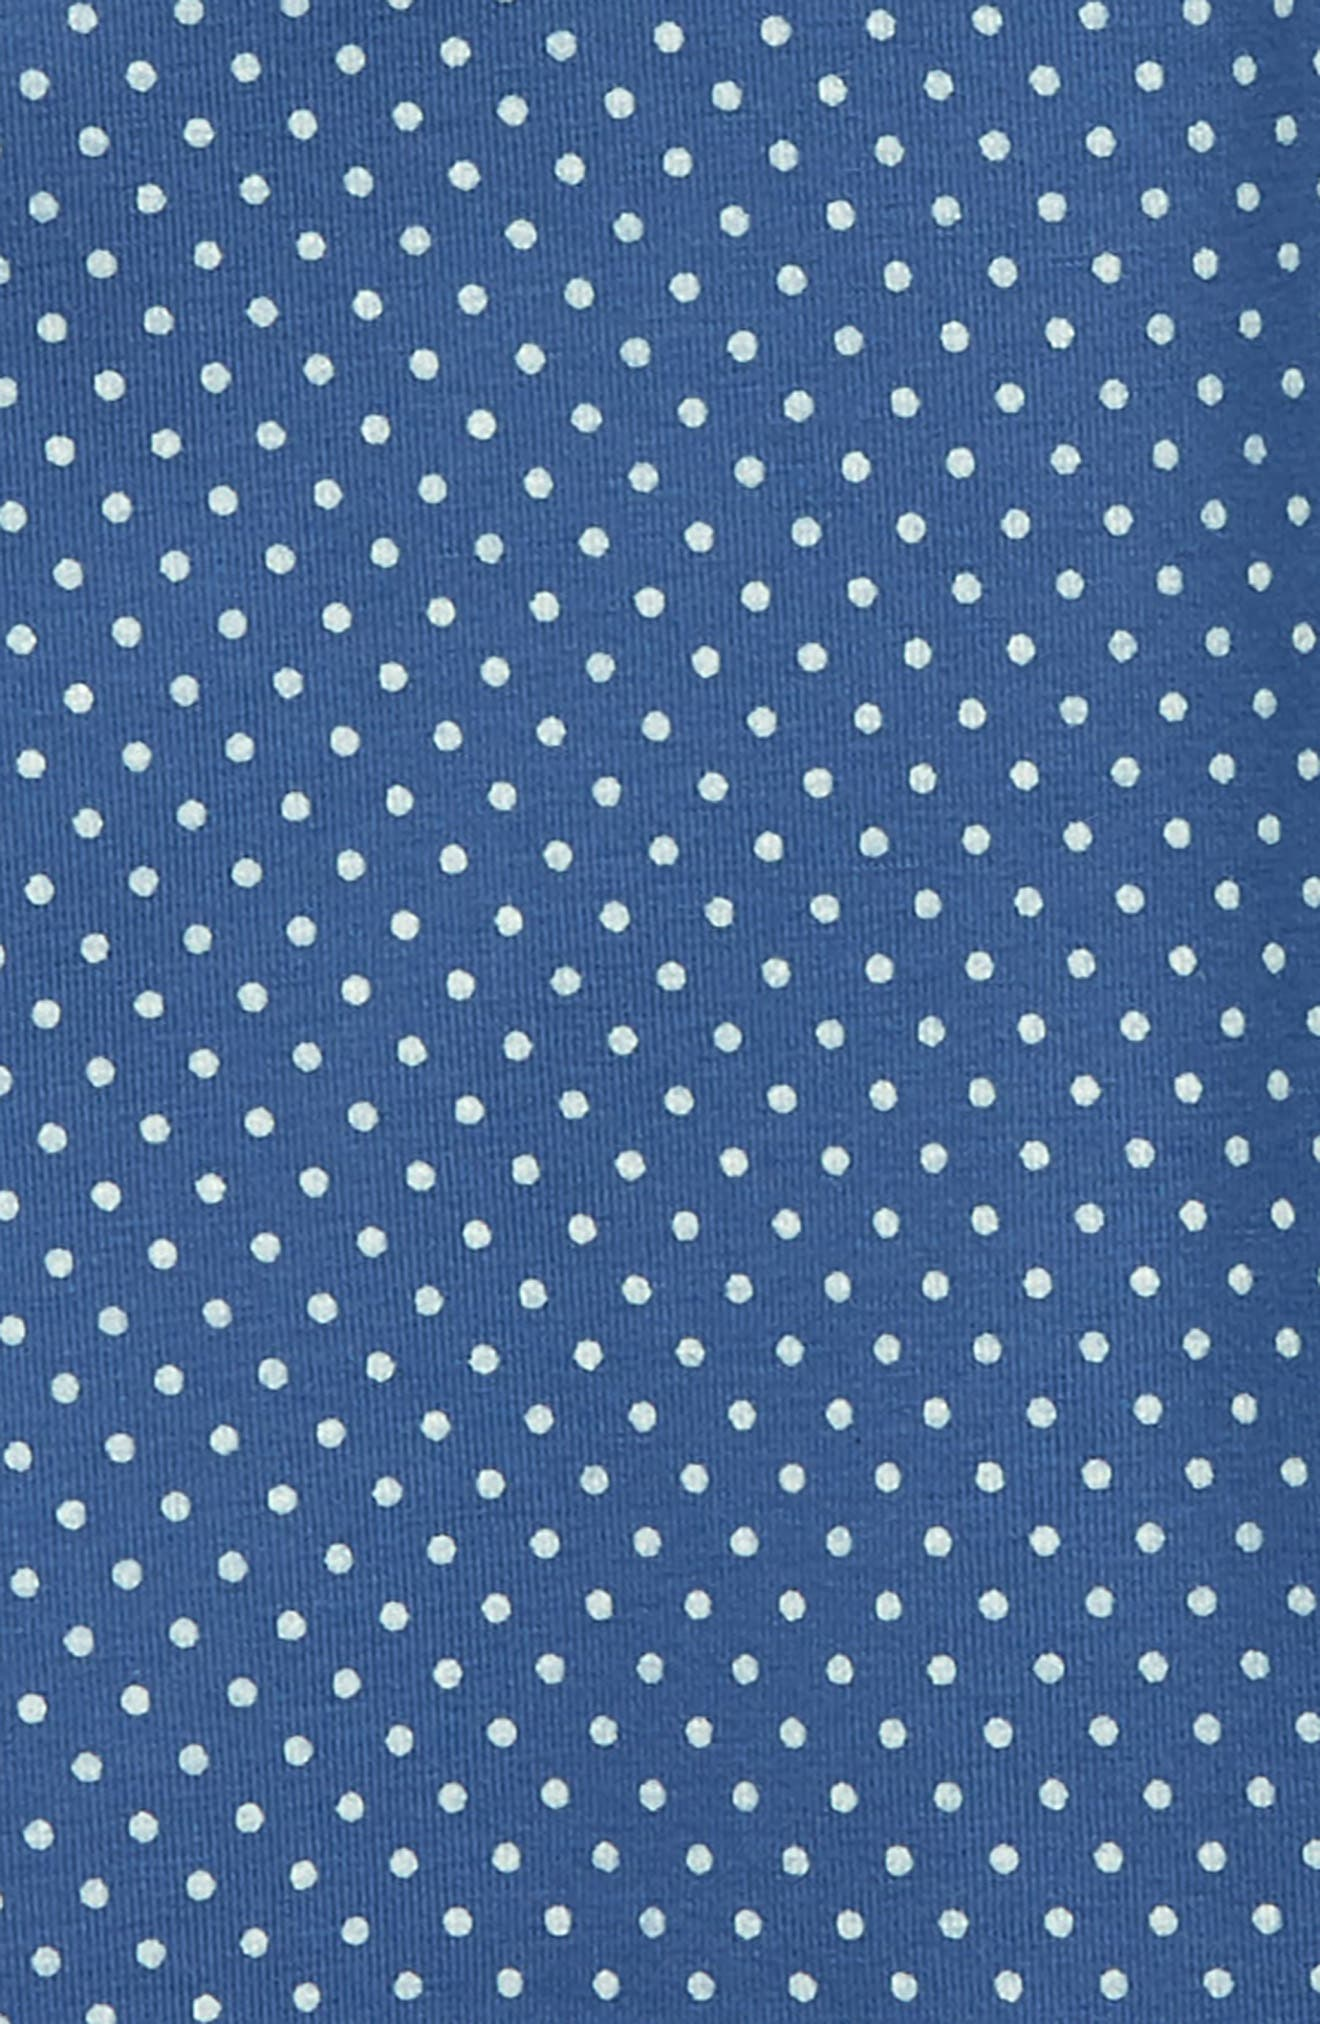 Pin Dot Capri Leggings,                             Alternate thumbnail 2, color,                             Cobalt